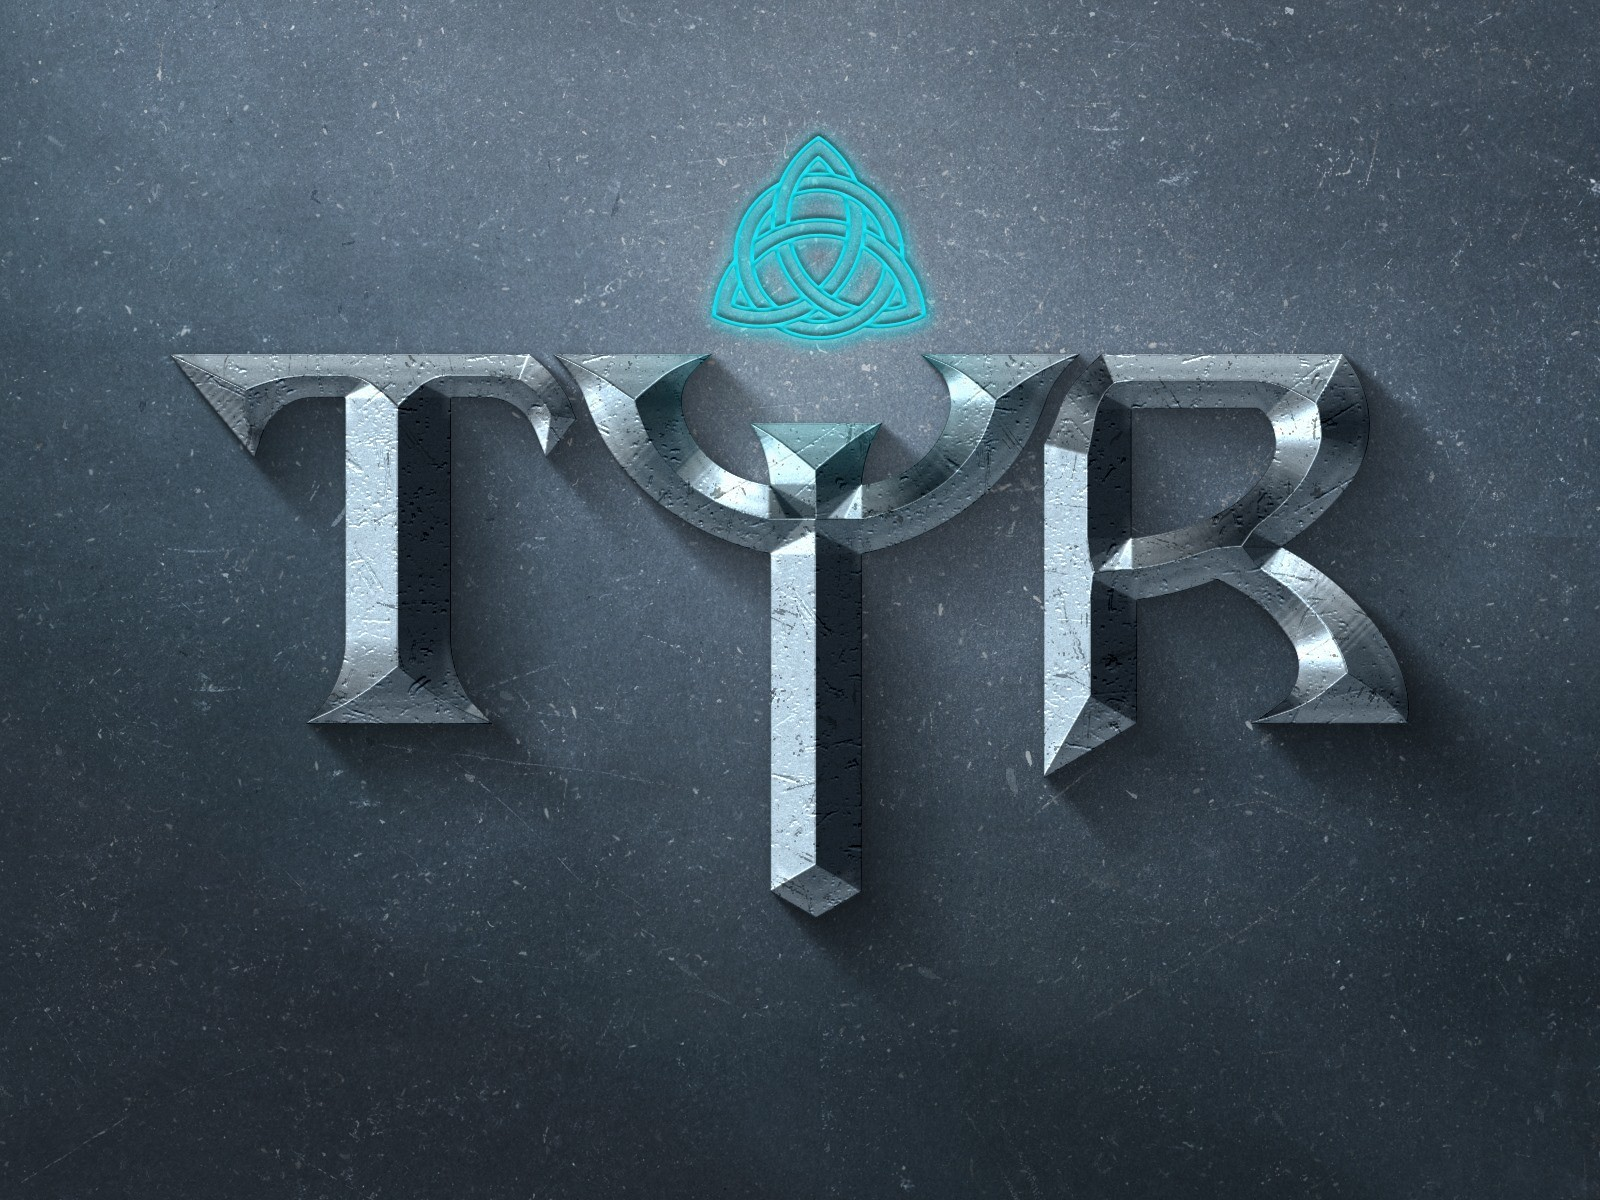 tyr_gamelab_character_design_remion_design_budapest_19